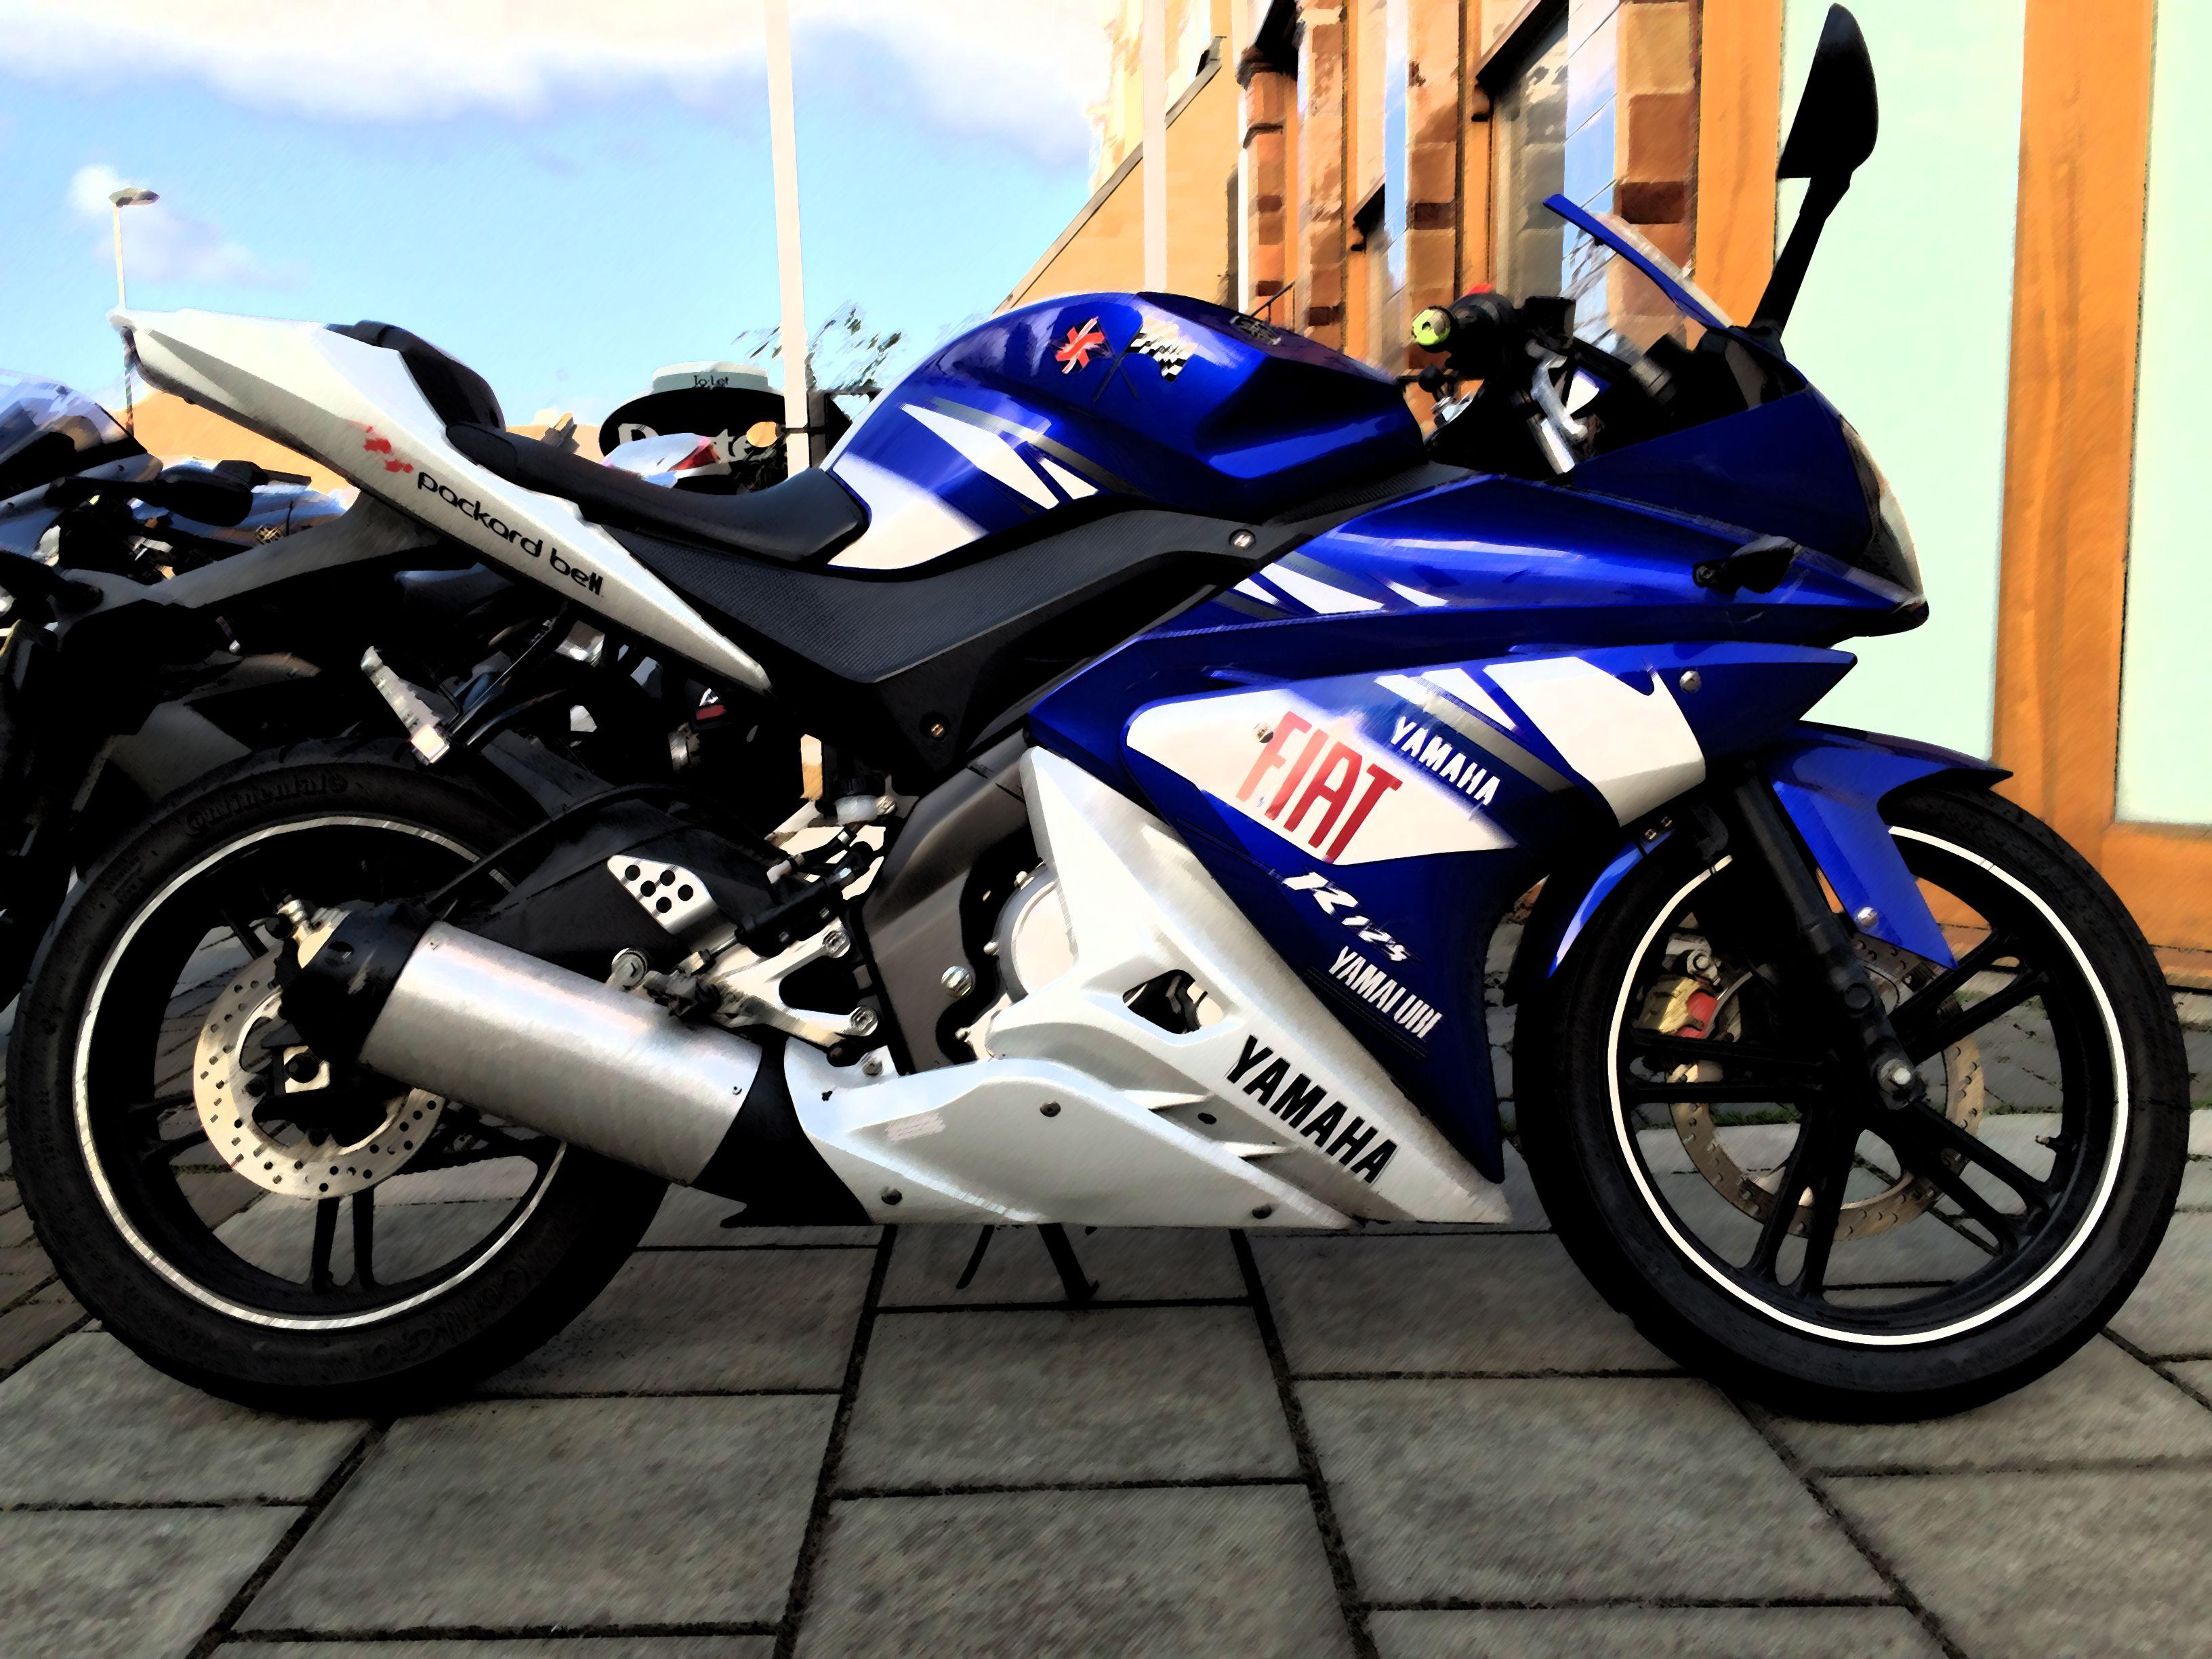 Yamaha YZF-R-125 Little R6 best 125cc bike